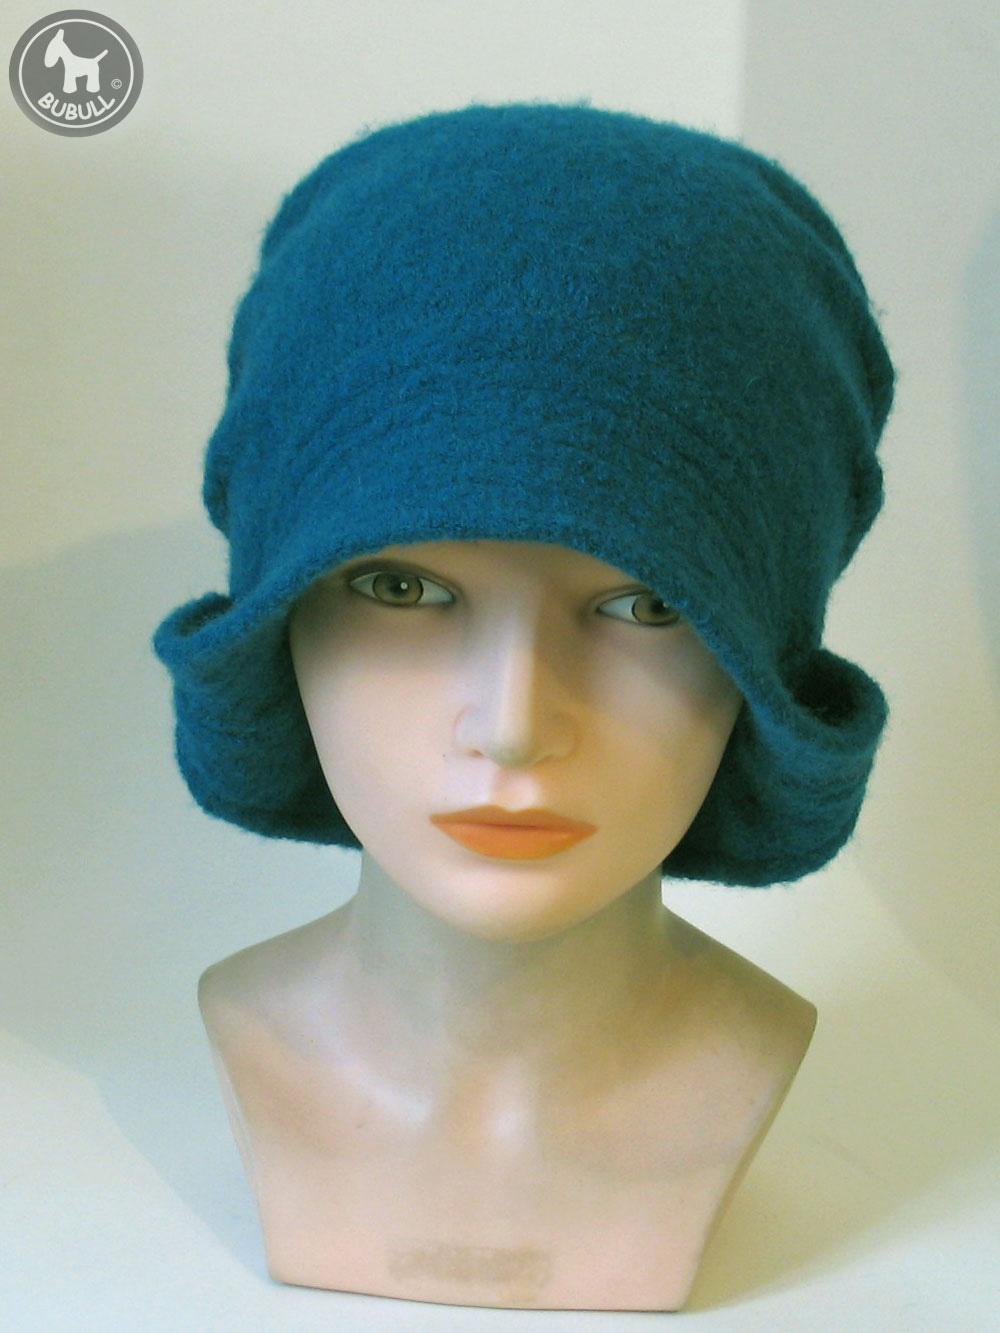 chapeau bleu canard laine ref 1387. Black Bedroom Furniture Sets. Home Design Ideas